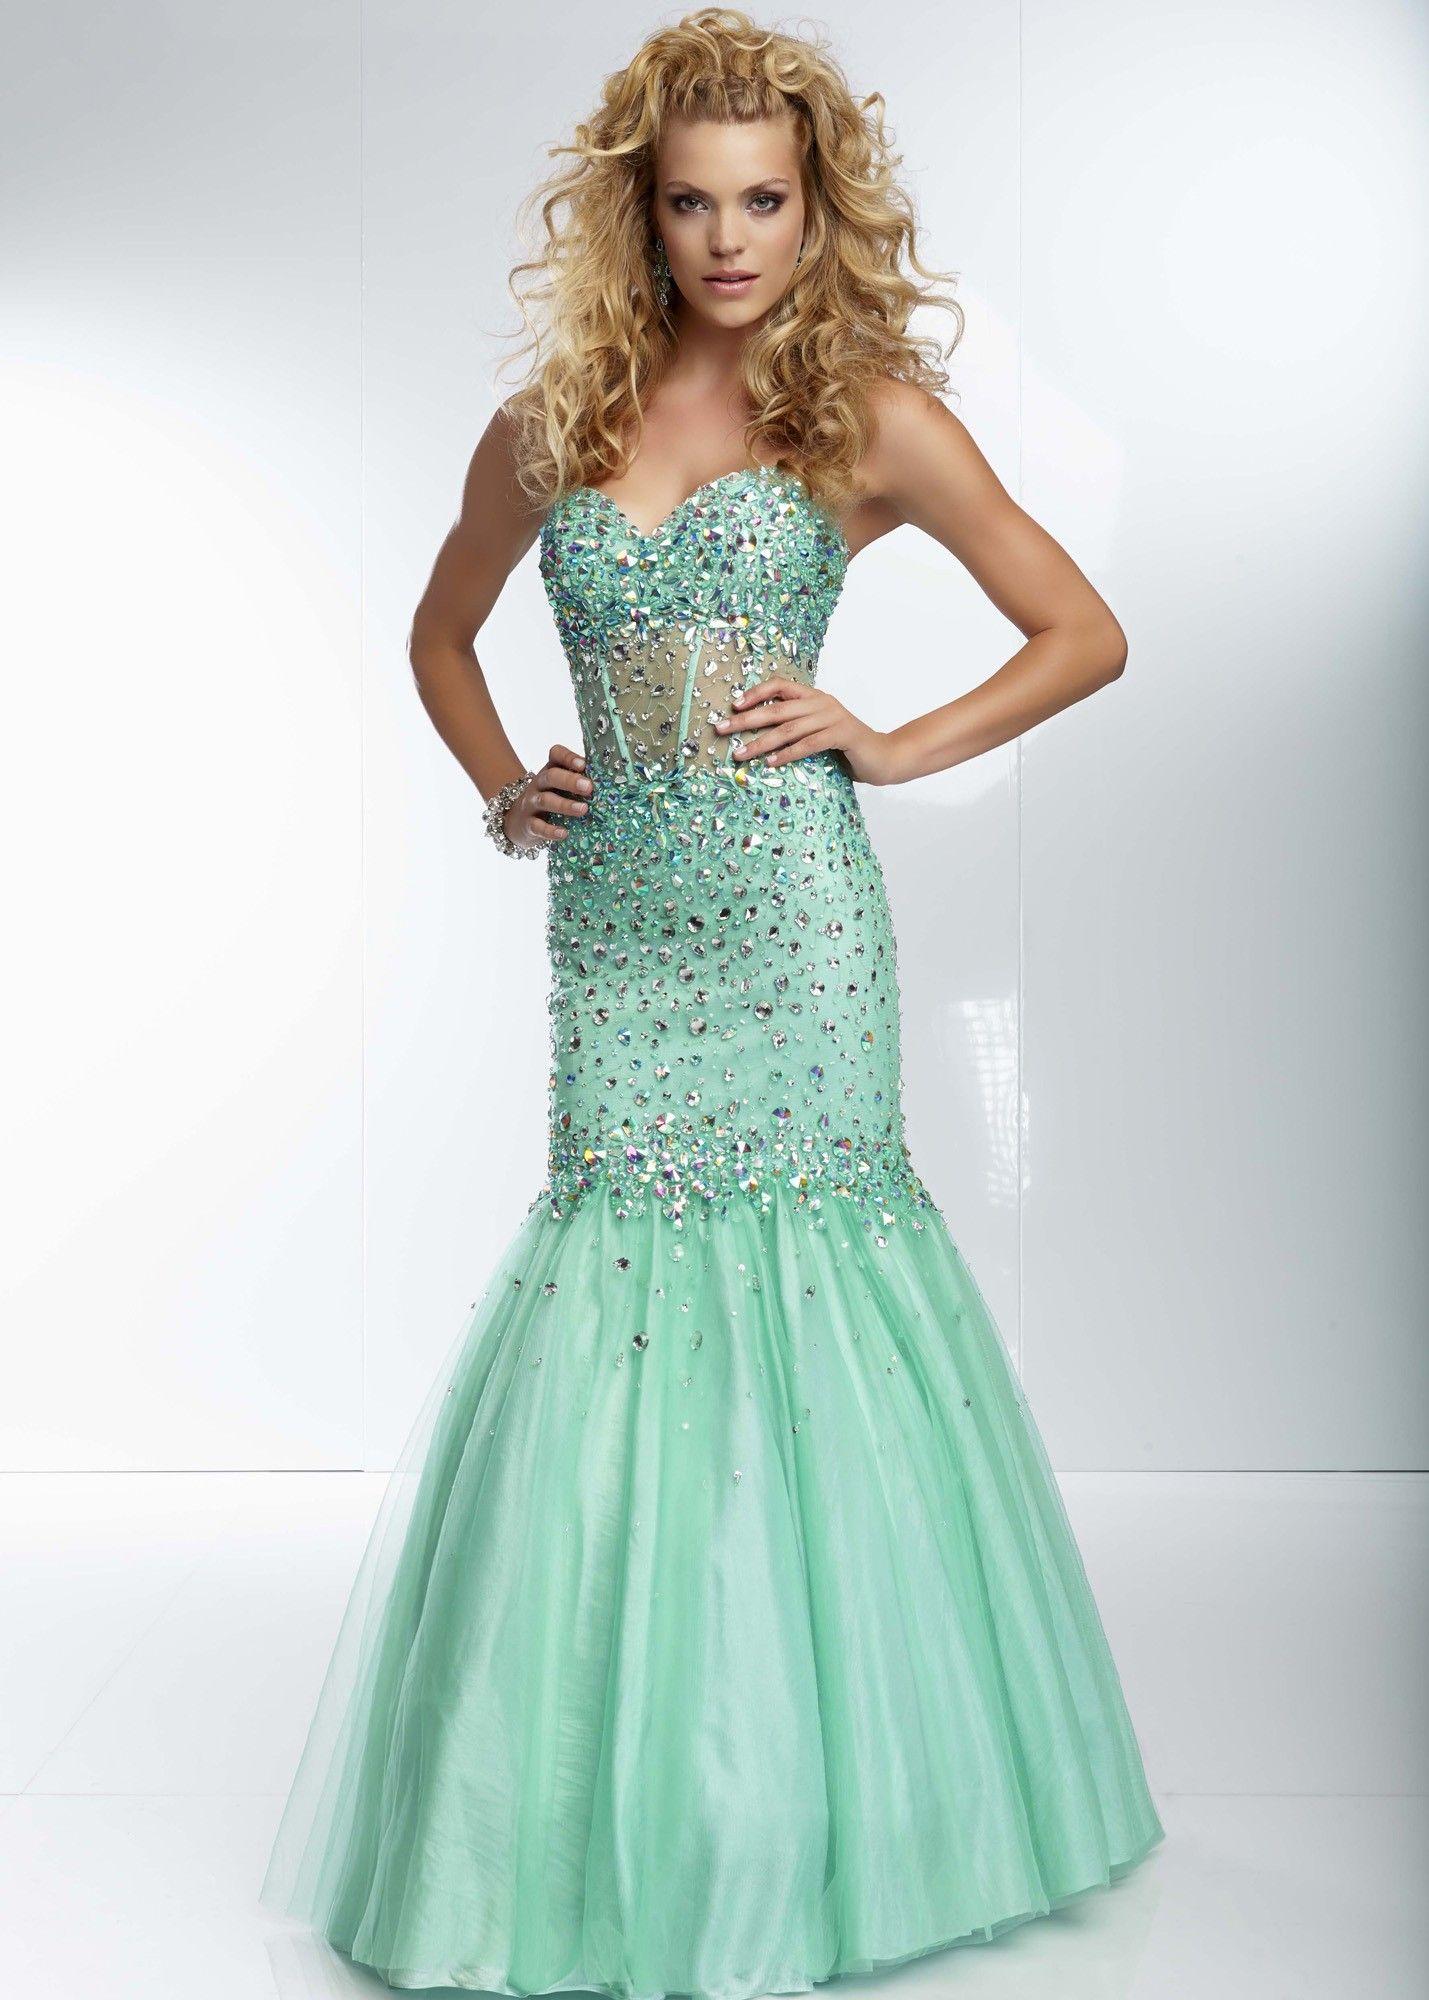 plus size mermaid gown aqua | Home Paparazzi 95101 Aqua/Blue Dress ...